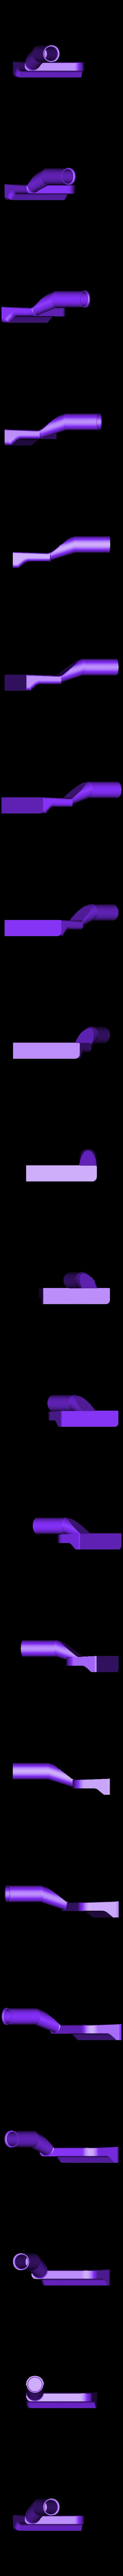 Putter_dia16mm.stl Download STL file Putter golf club • Template to 3D print, 3d-fabric-jean-pierre